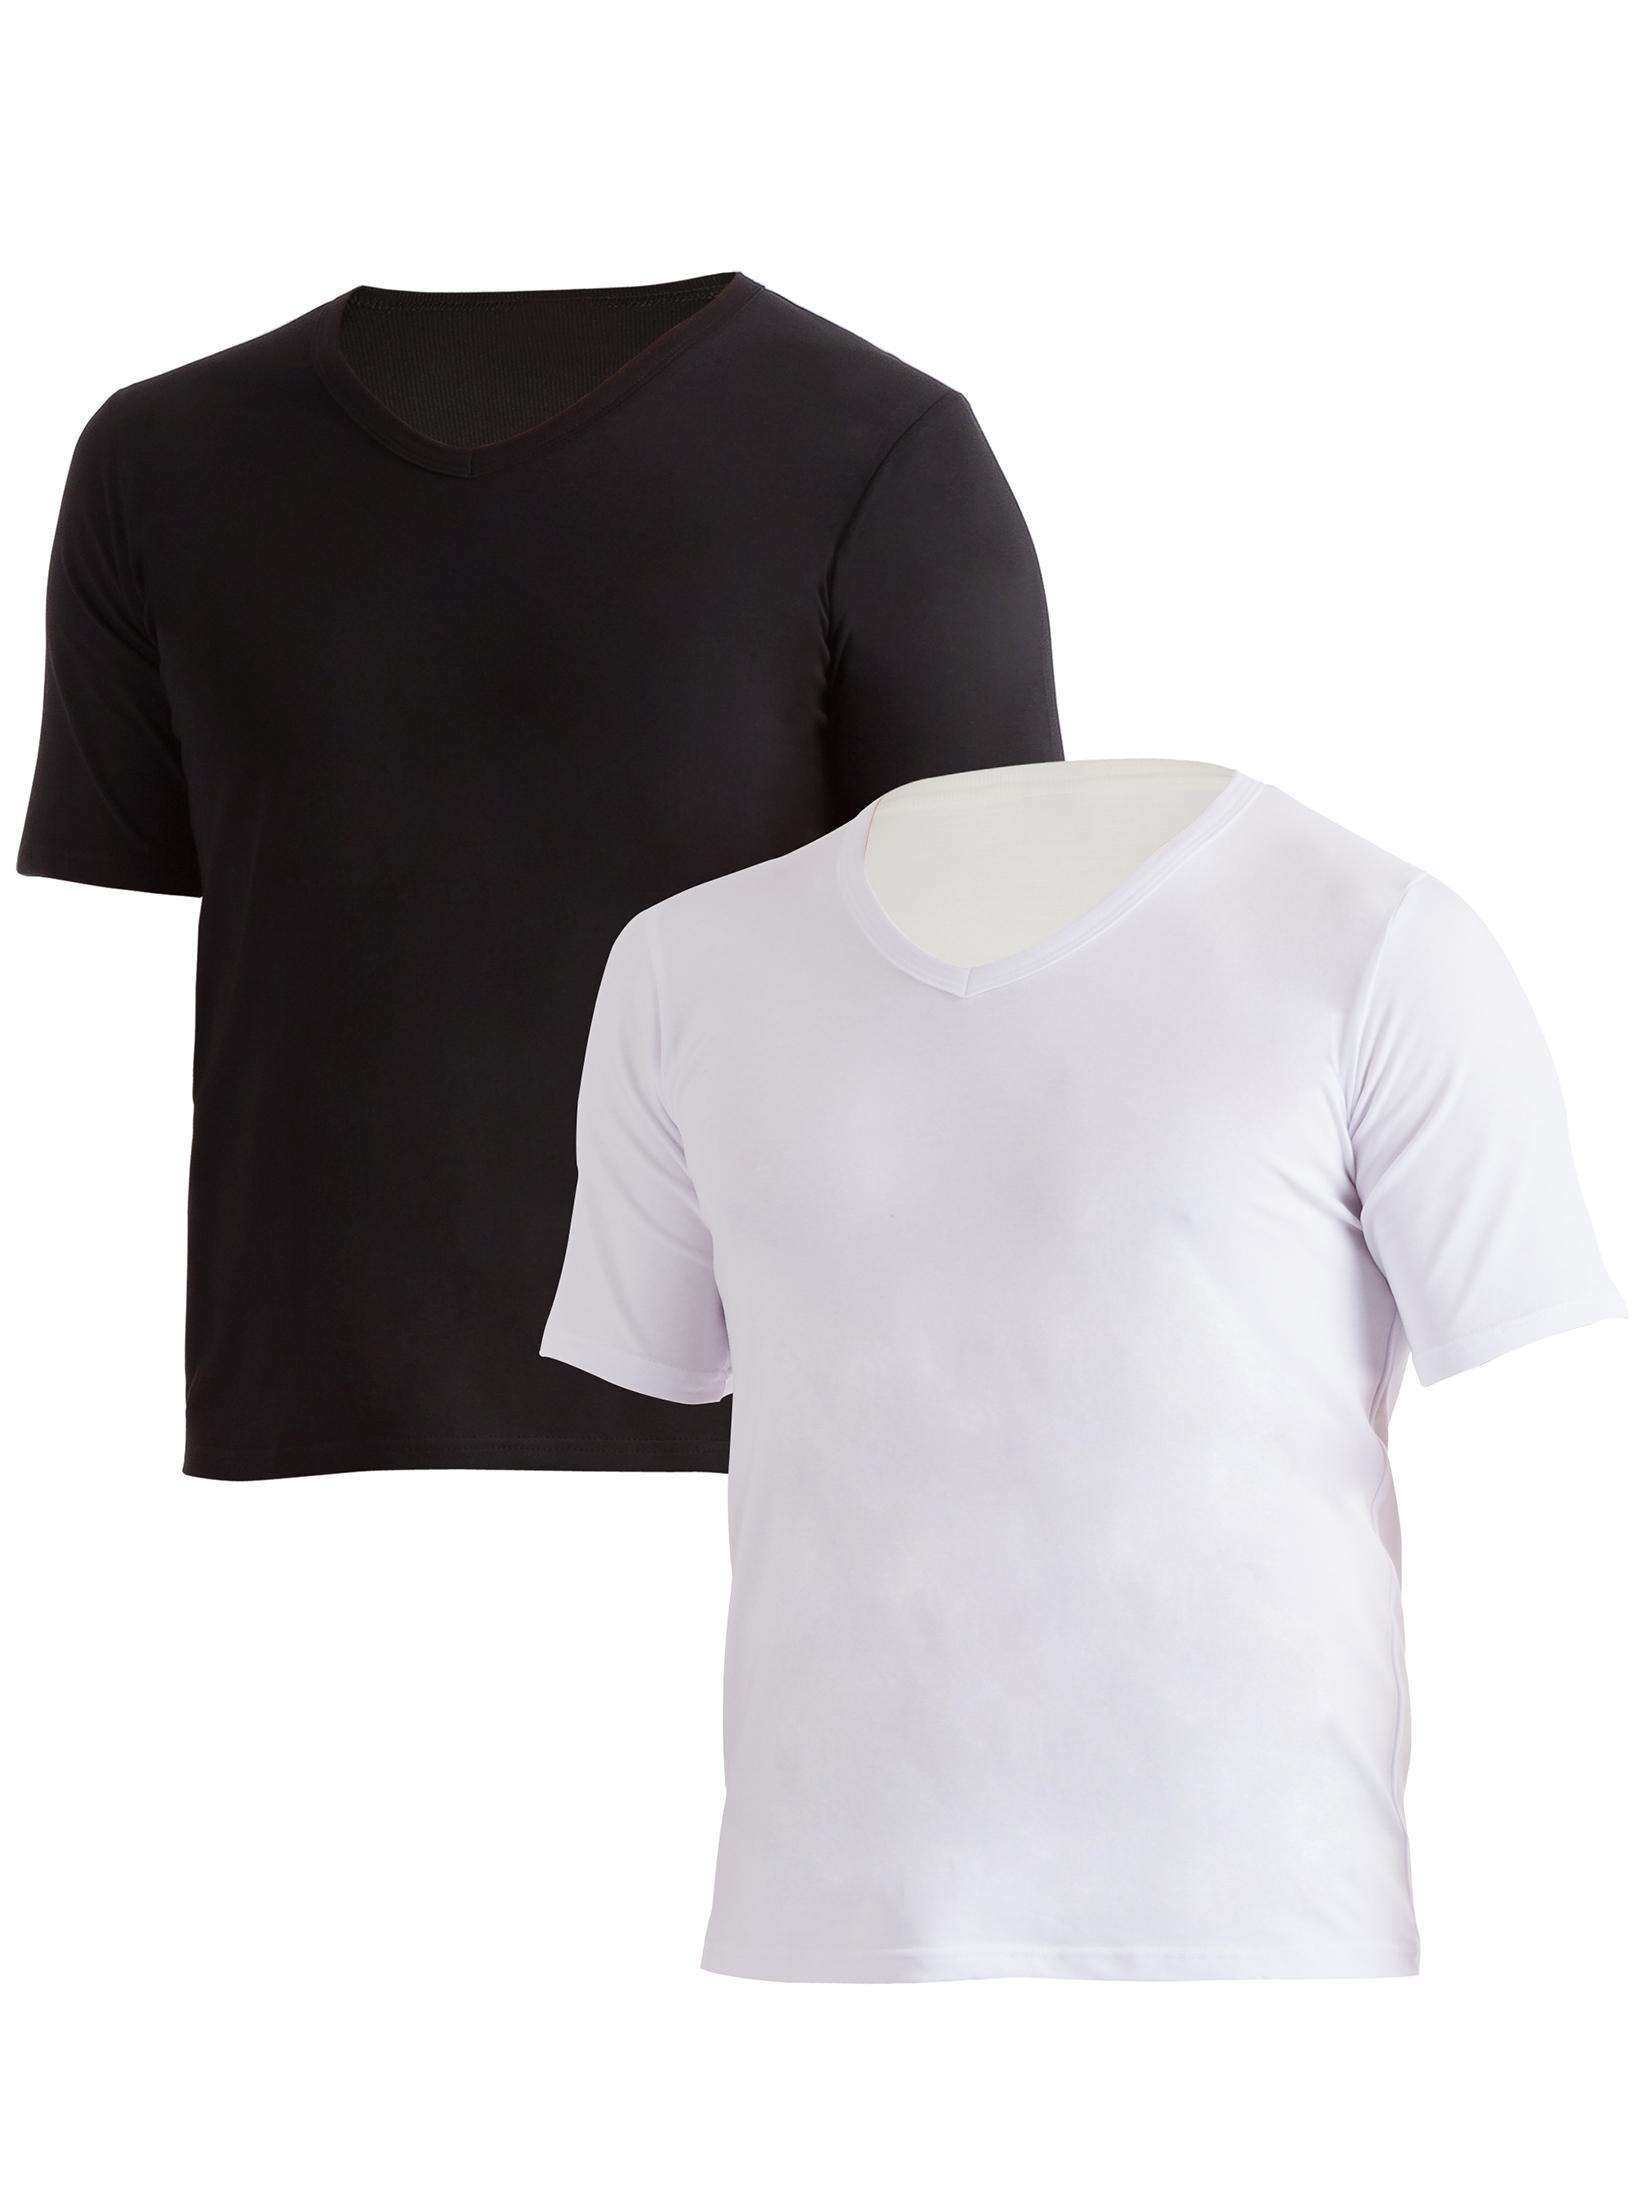 Ultrasport T-shirt homme col en V